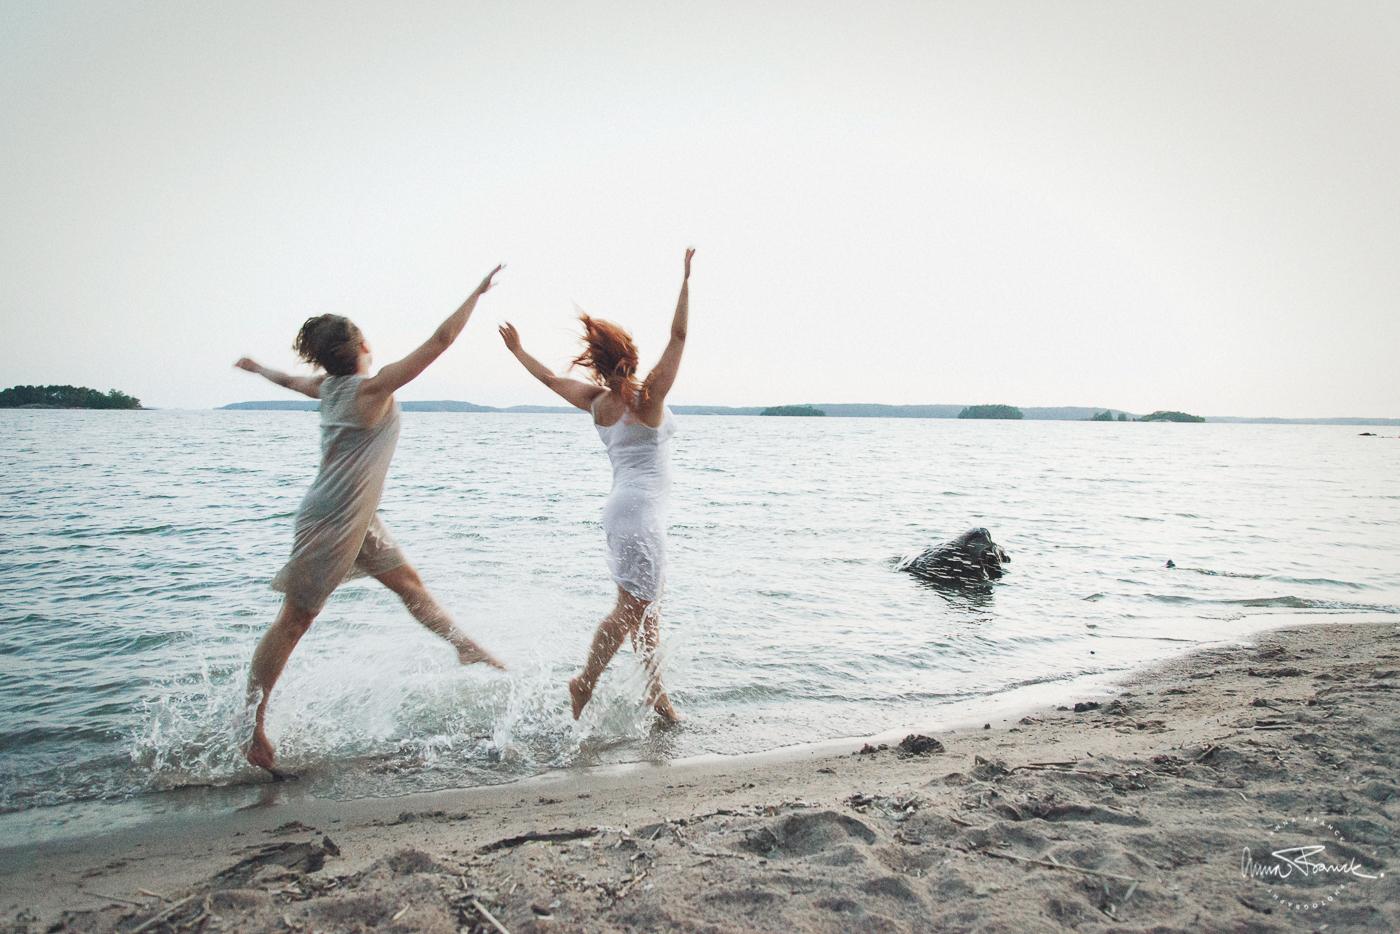 sisters, systrar, siskot, dance, dans, tanssi, metsä, skog, forest, beach, strand, ranta, auringonlasku, solnedgång, sunset, art, taide, konst, tillsammans, samtidigt, yhdessä, together, bonding, nature, natur, luonto